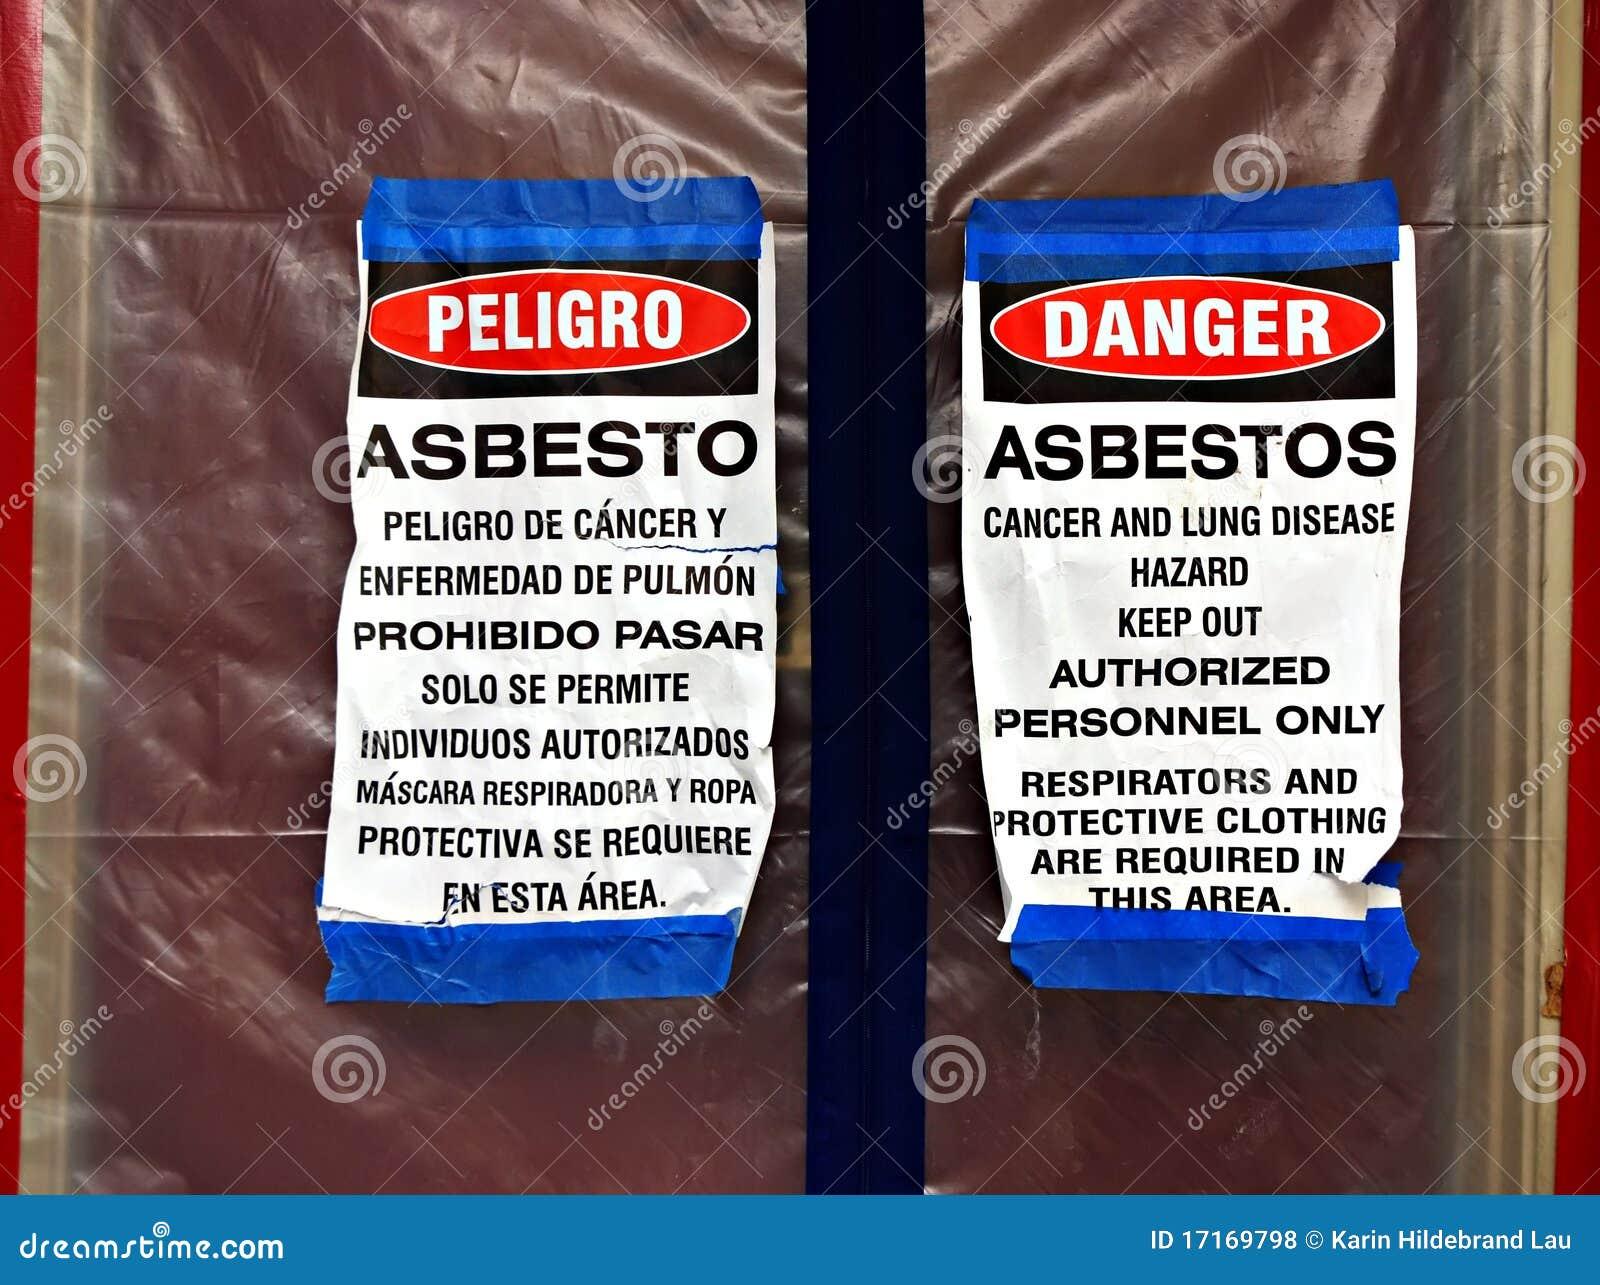 Asbestos Abatement Signs Royalty Free Stock Photos Image